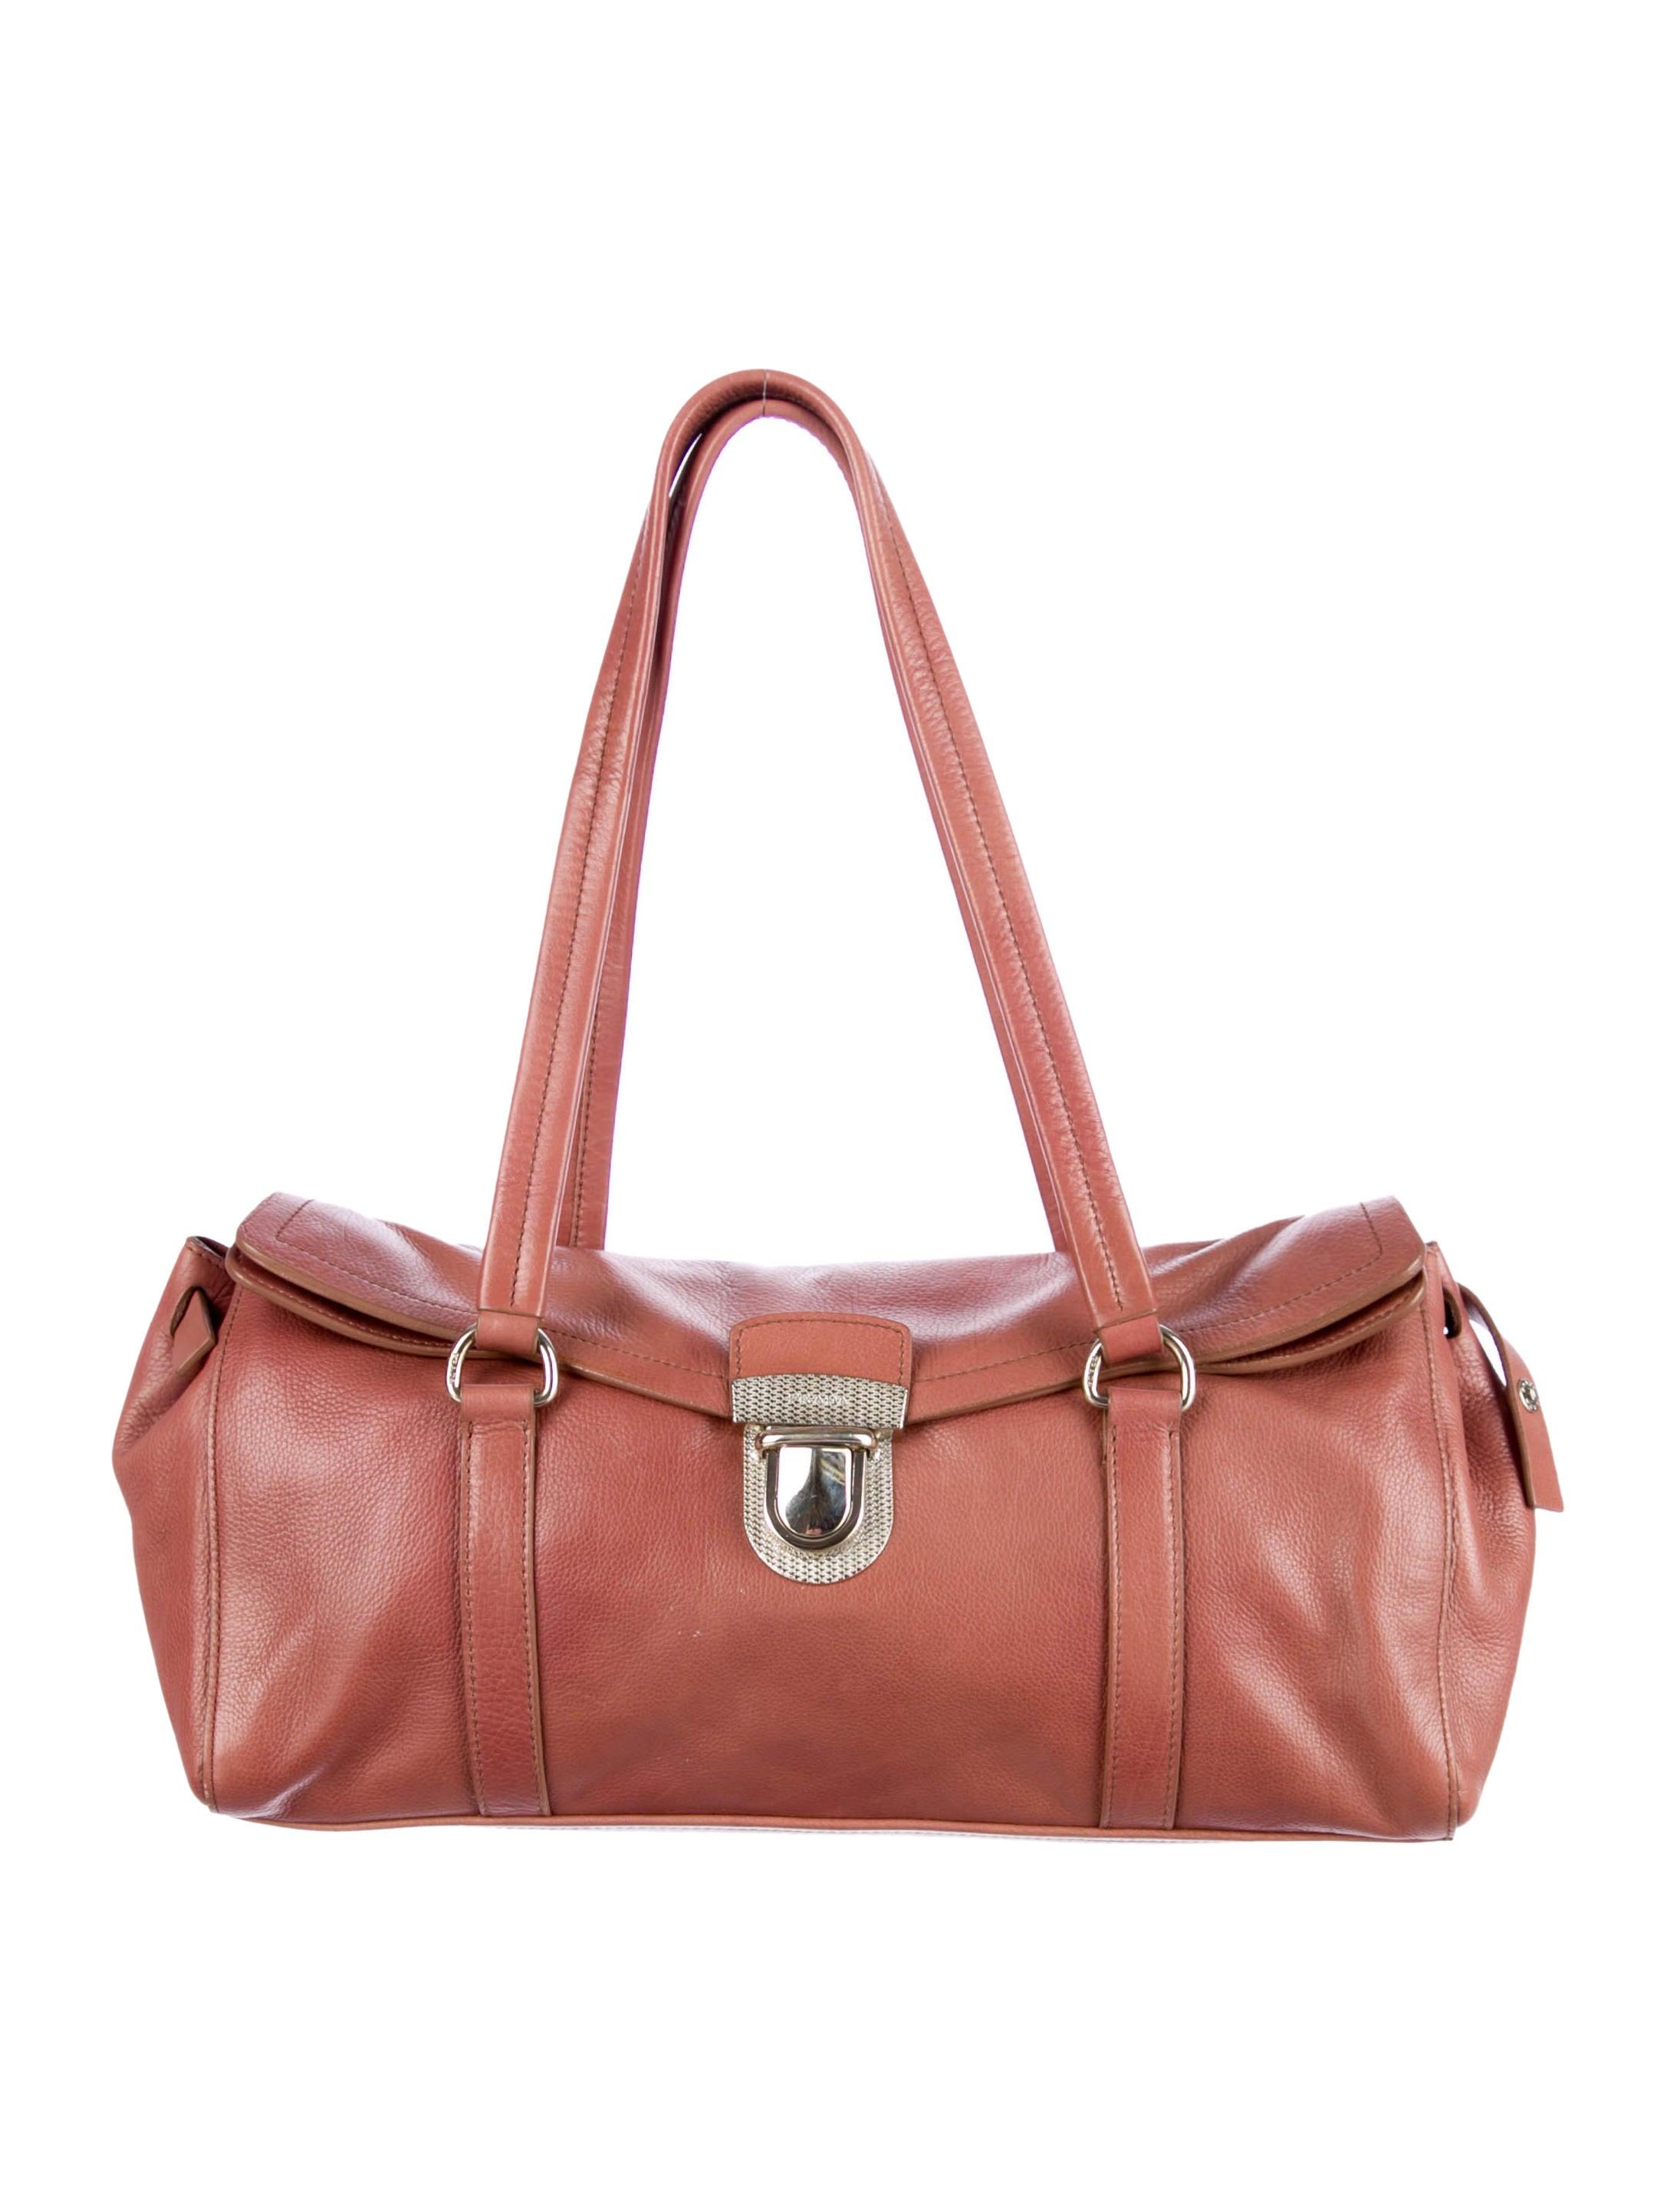 red leather prada purse - prada crocodile easy bag, prada saffiano wallet mens